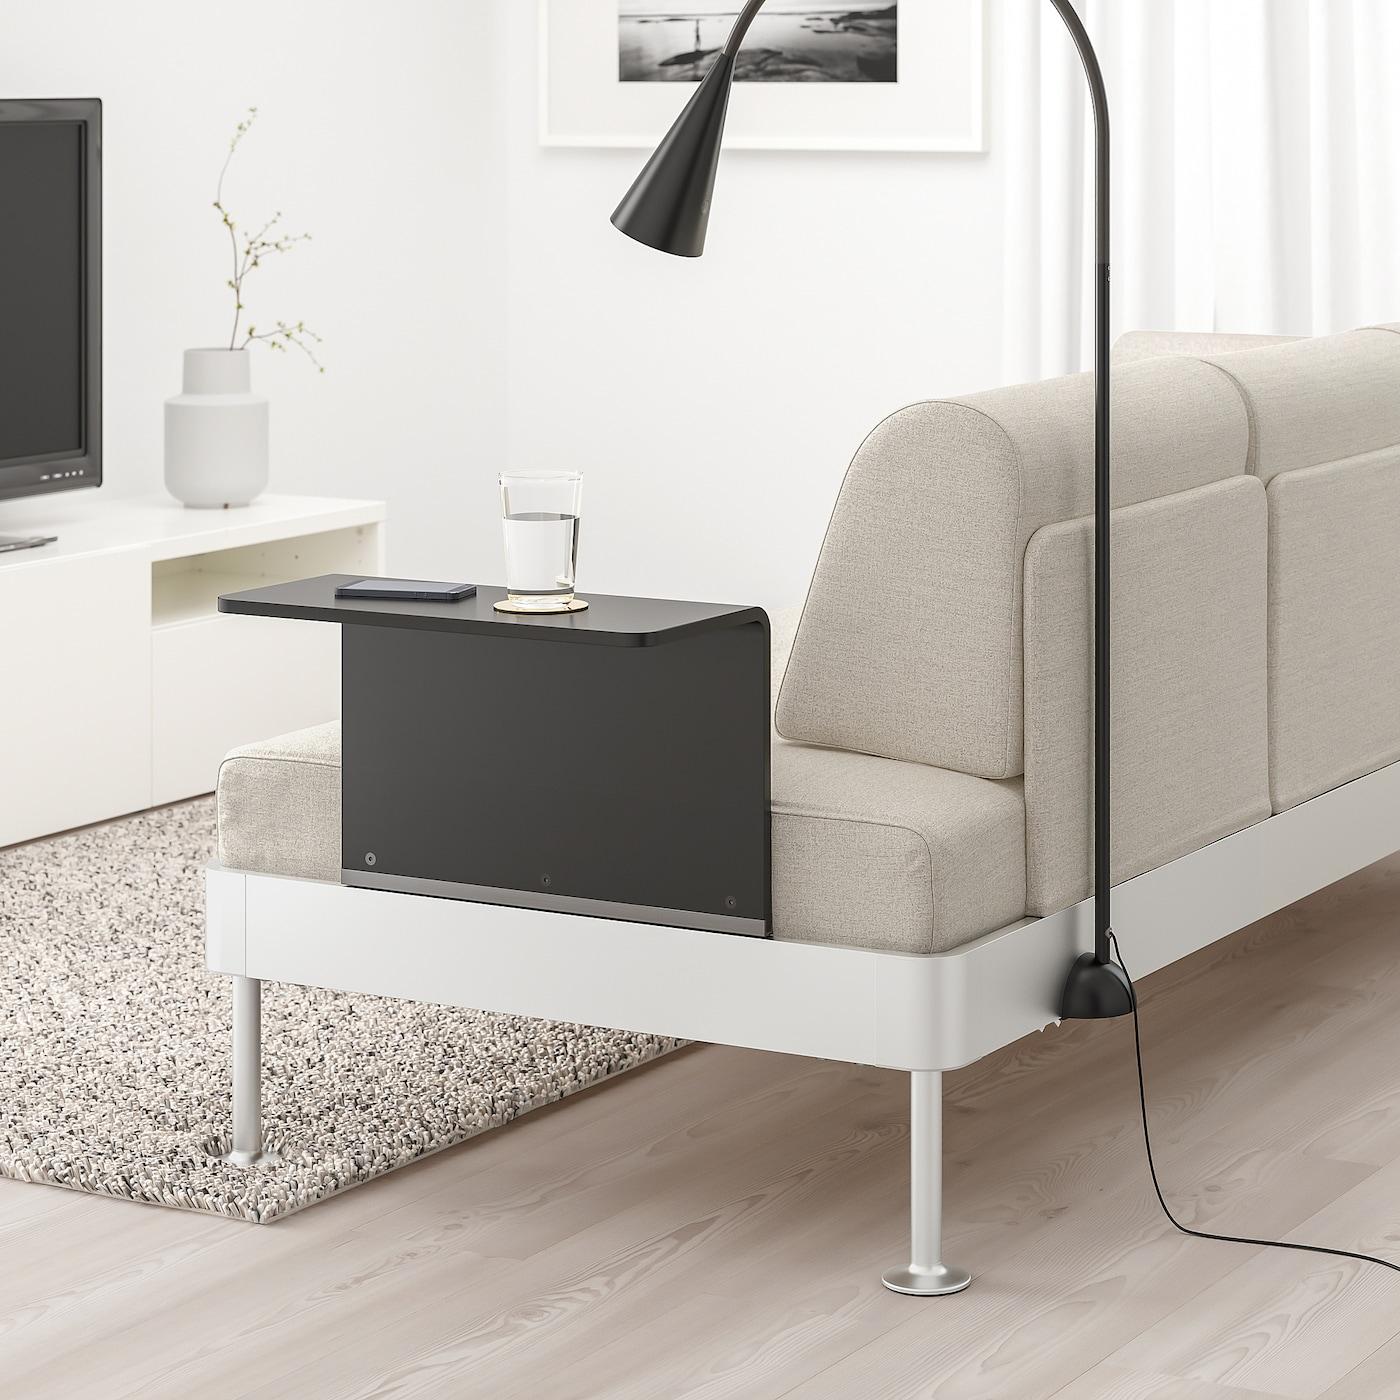 Picture of: Https Www Ikea Com No No P Delaktig 3 Seters Sofa Med Bord Og Lampe Gunnared Beige S19289077 Ikea